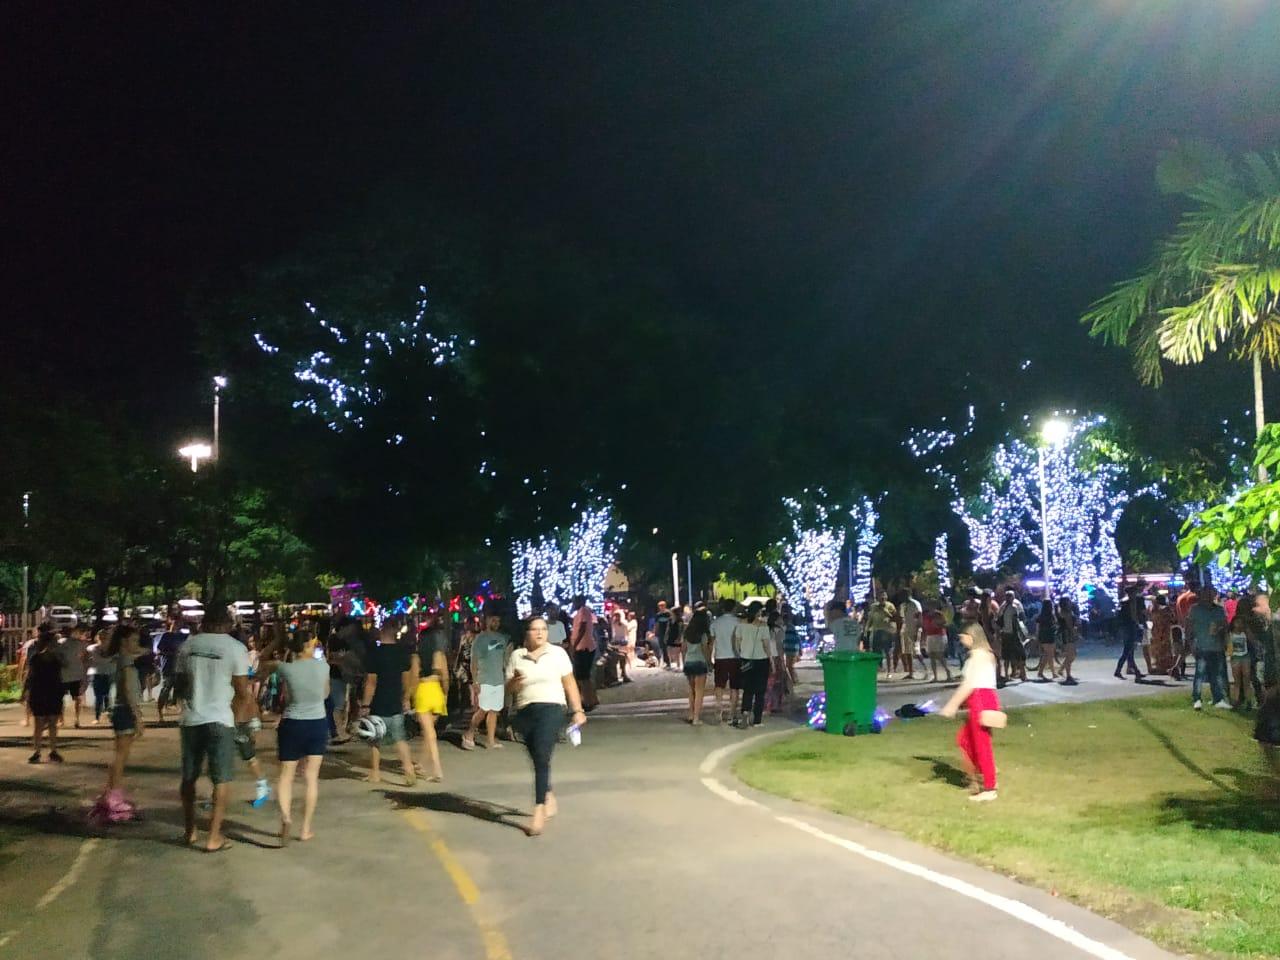 Parque ipanema natal - Marcelo Augusto